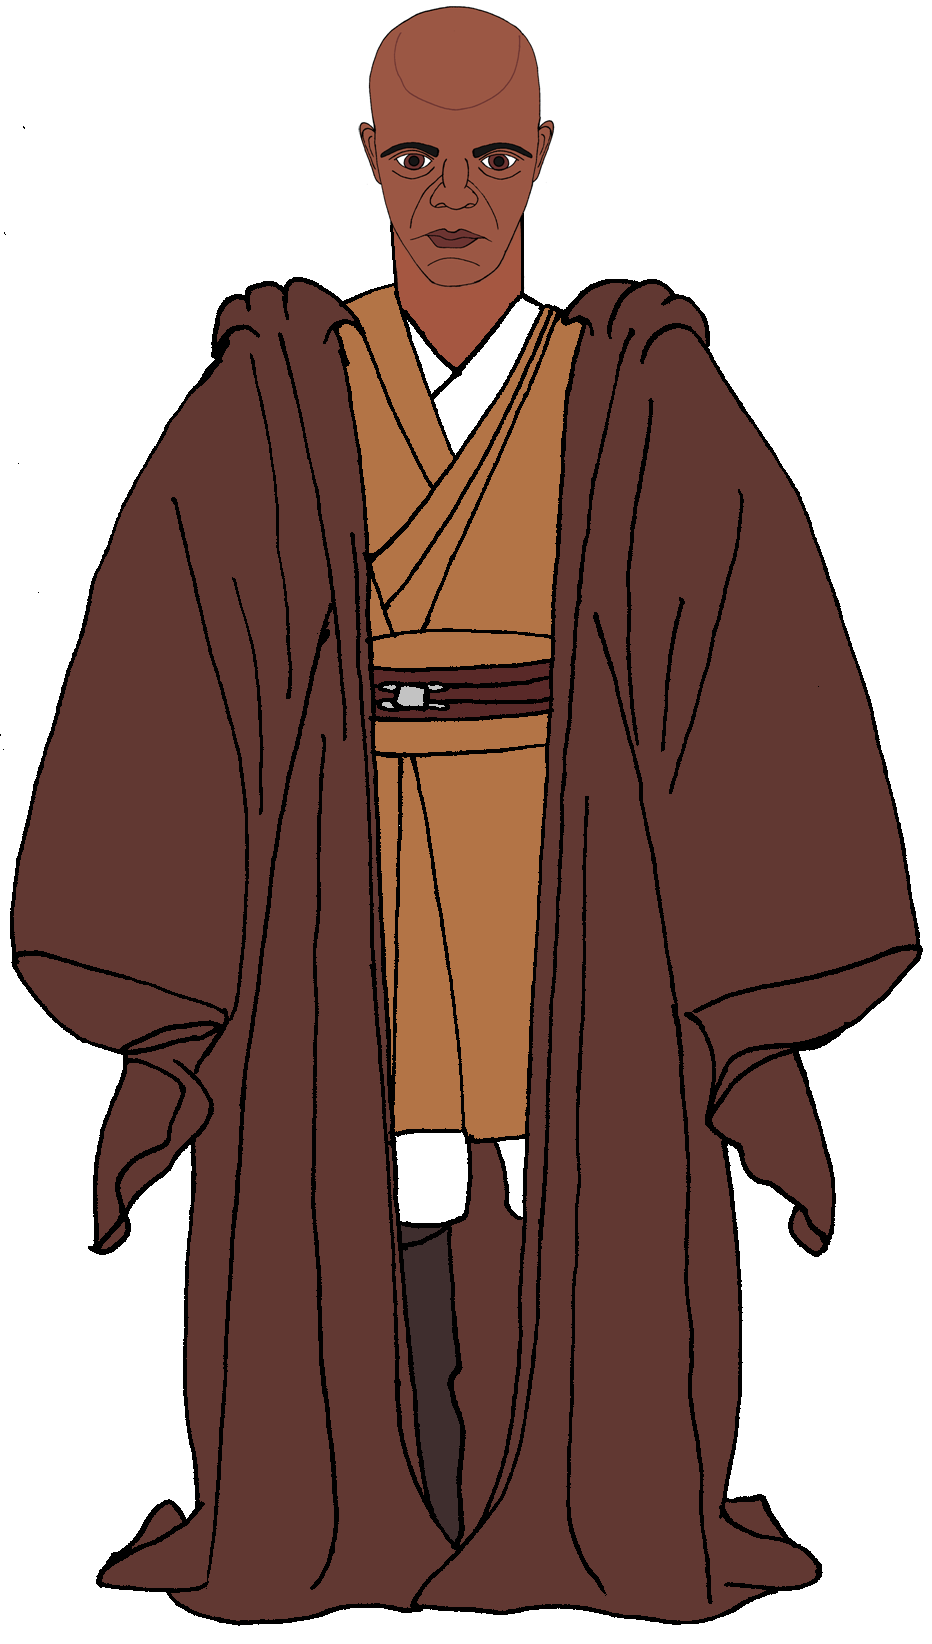 Mace Windu Cloaked Mace Windu Nun Dress Cloak